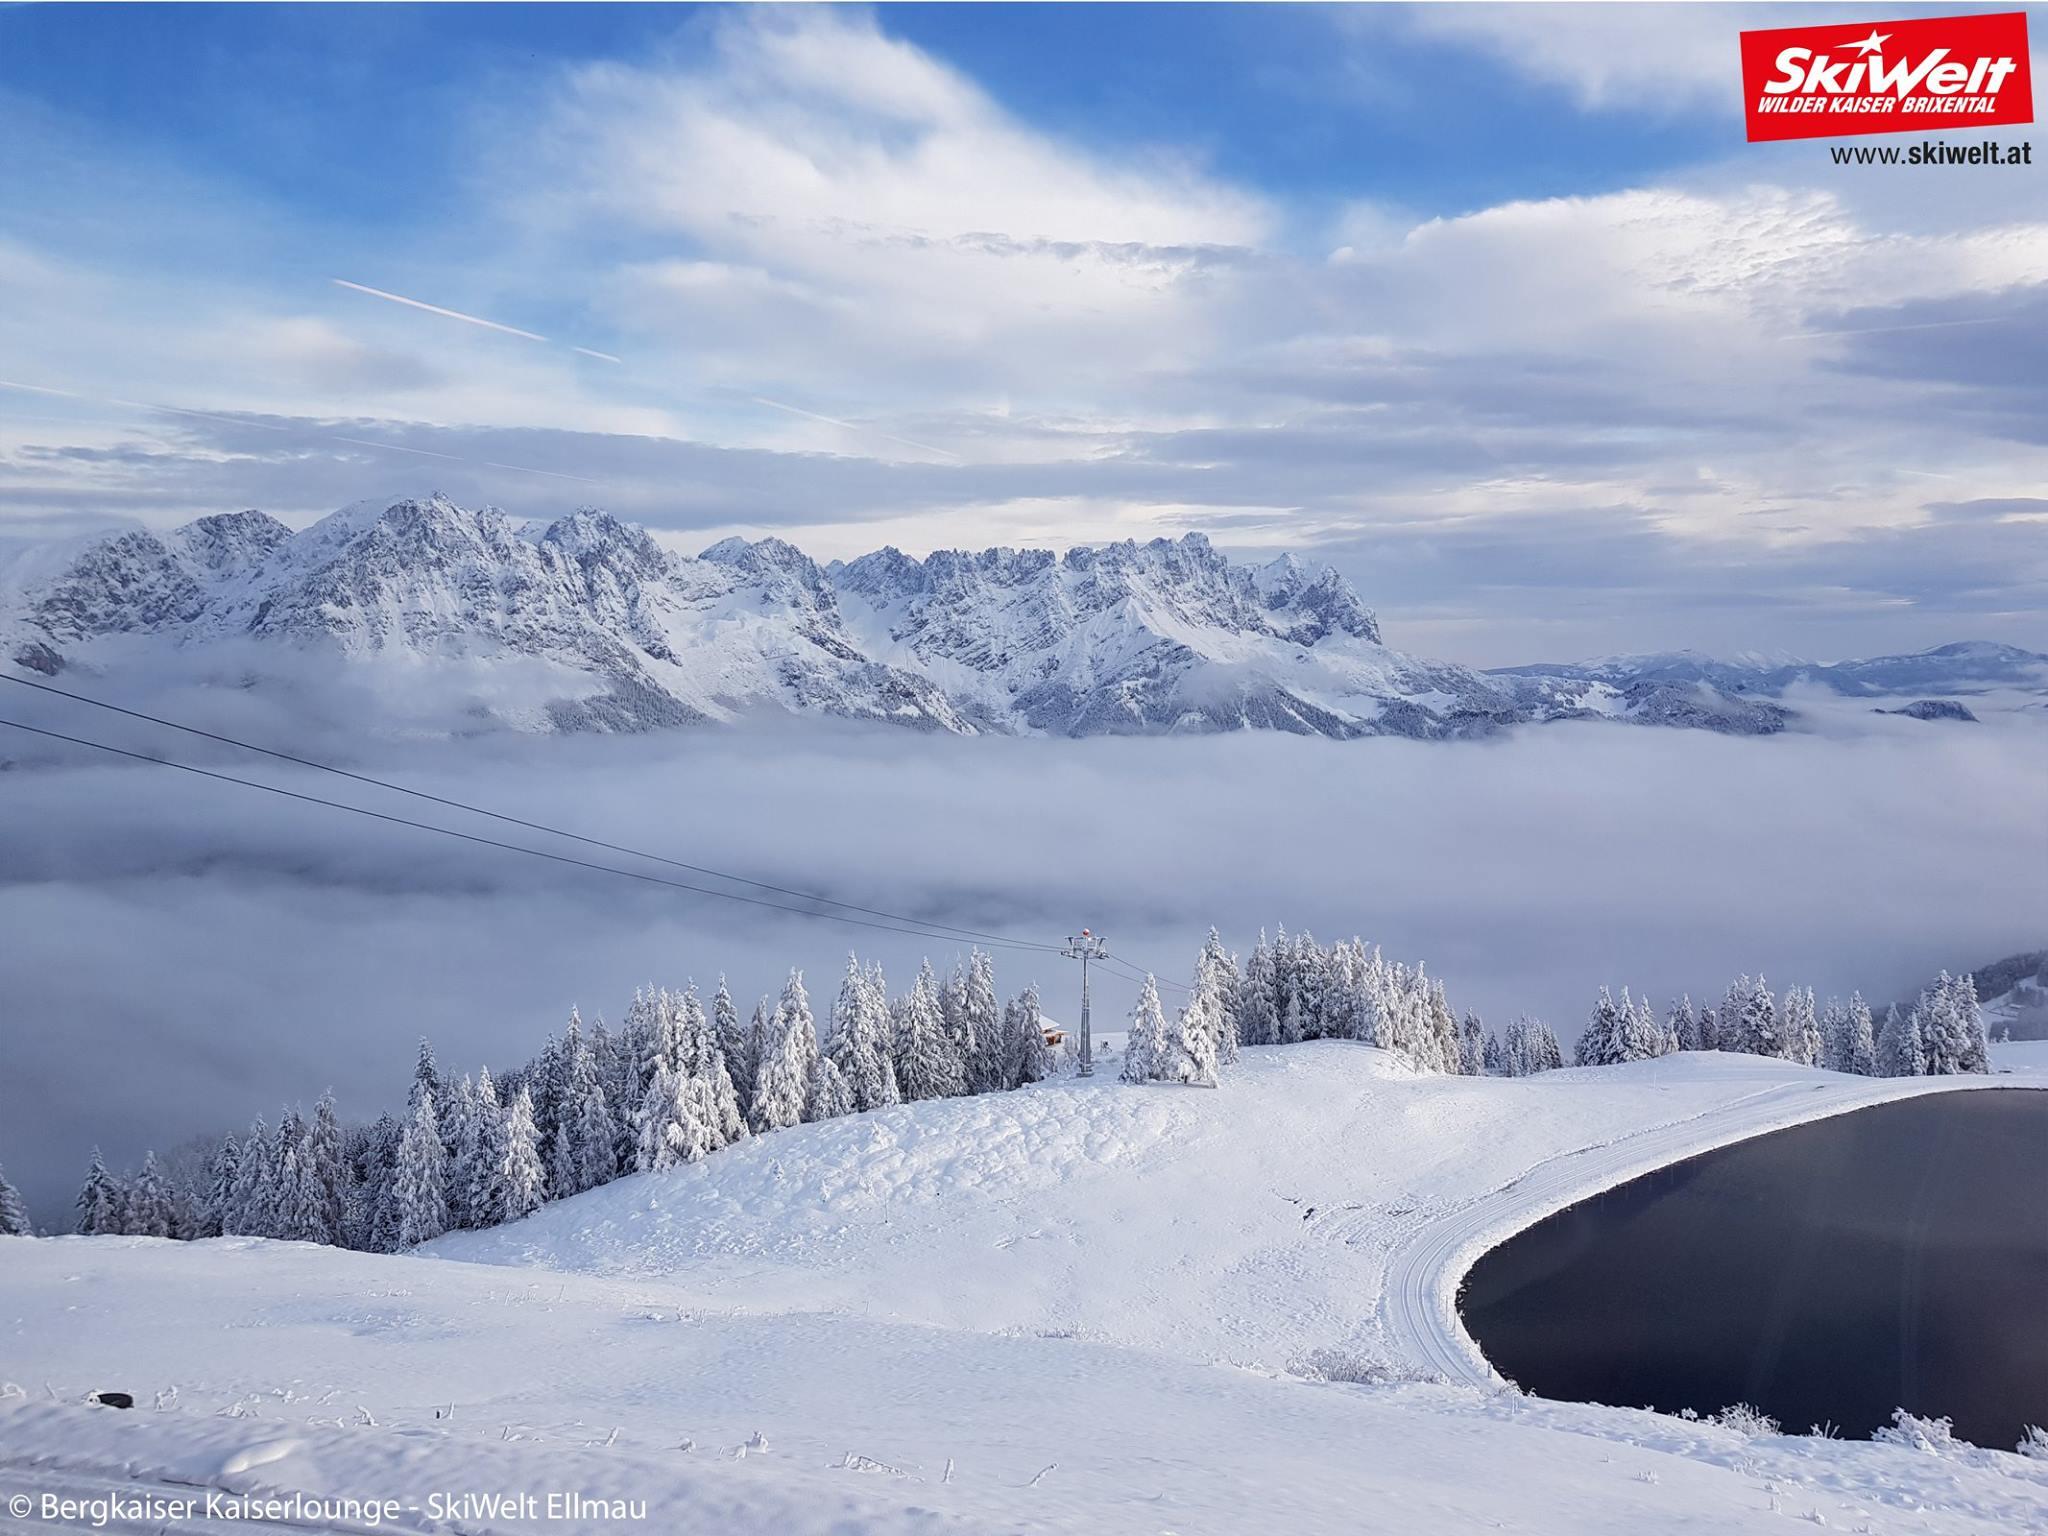 Skiwelt wilder kaiser brixental 1